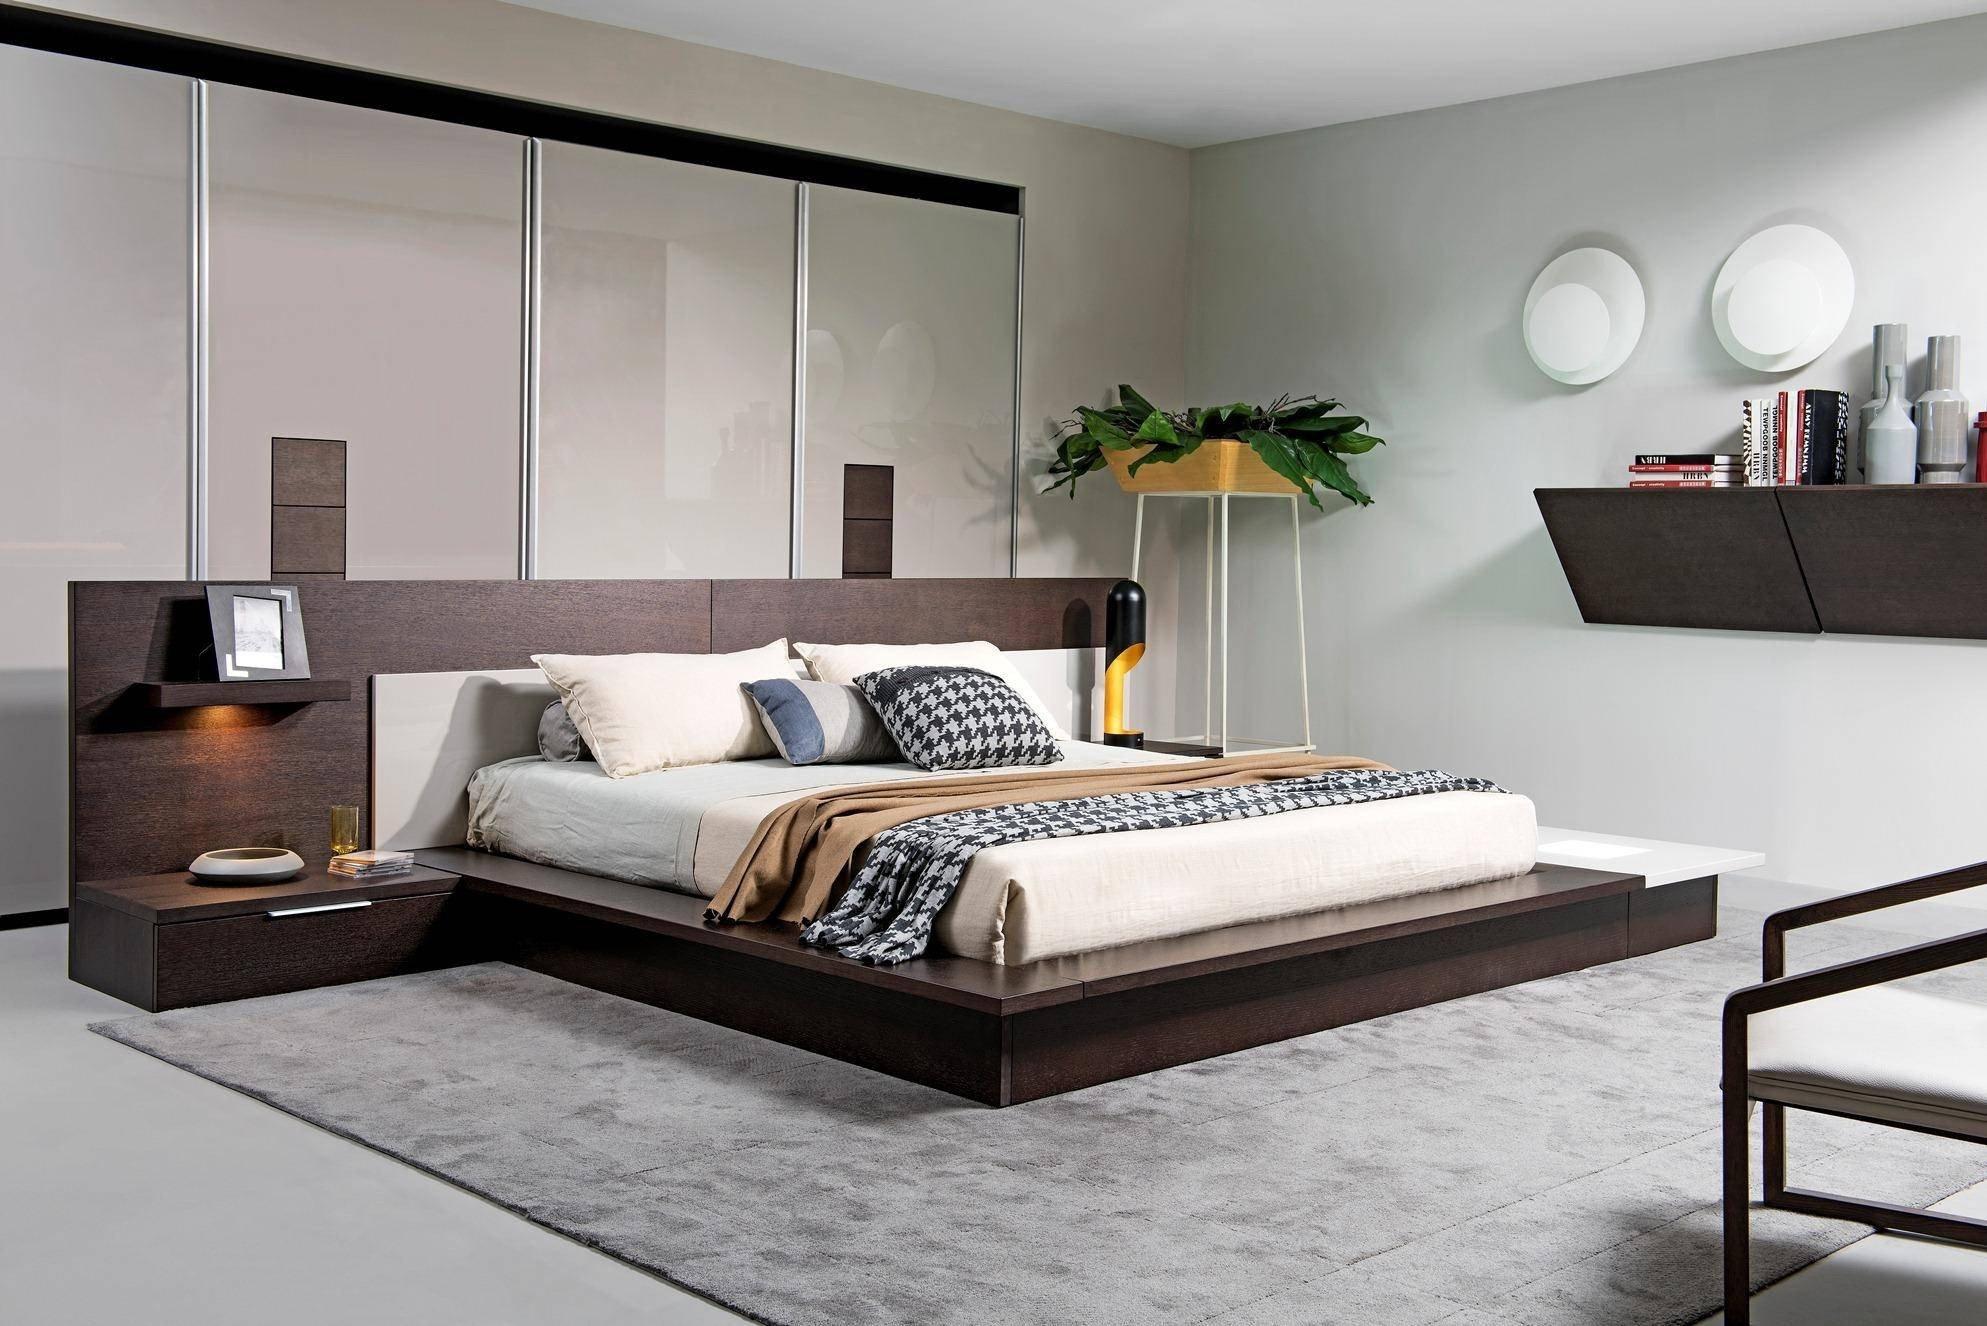 Side Table for Bedroom Fresh Vig Modrest torino Brown Oak Grey Queen Bed W Lights Built